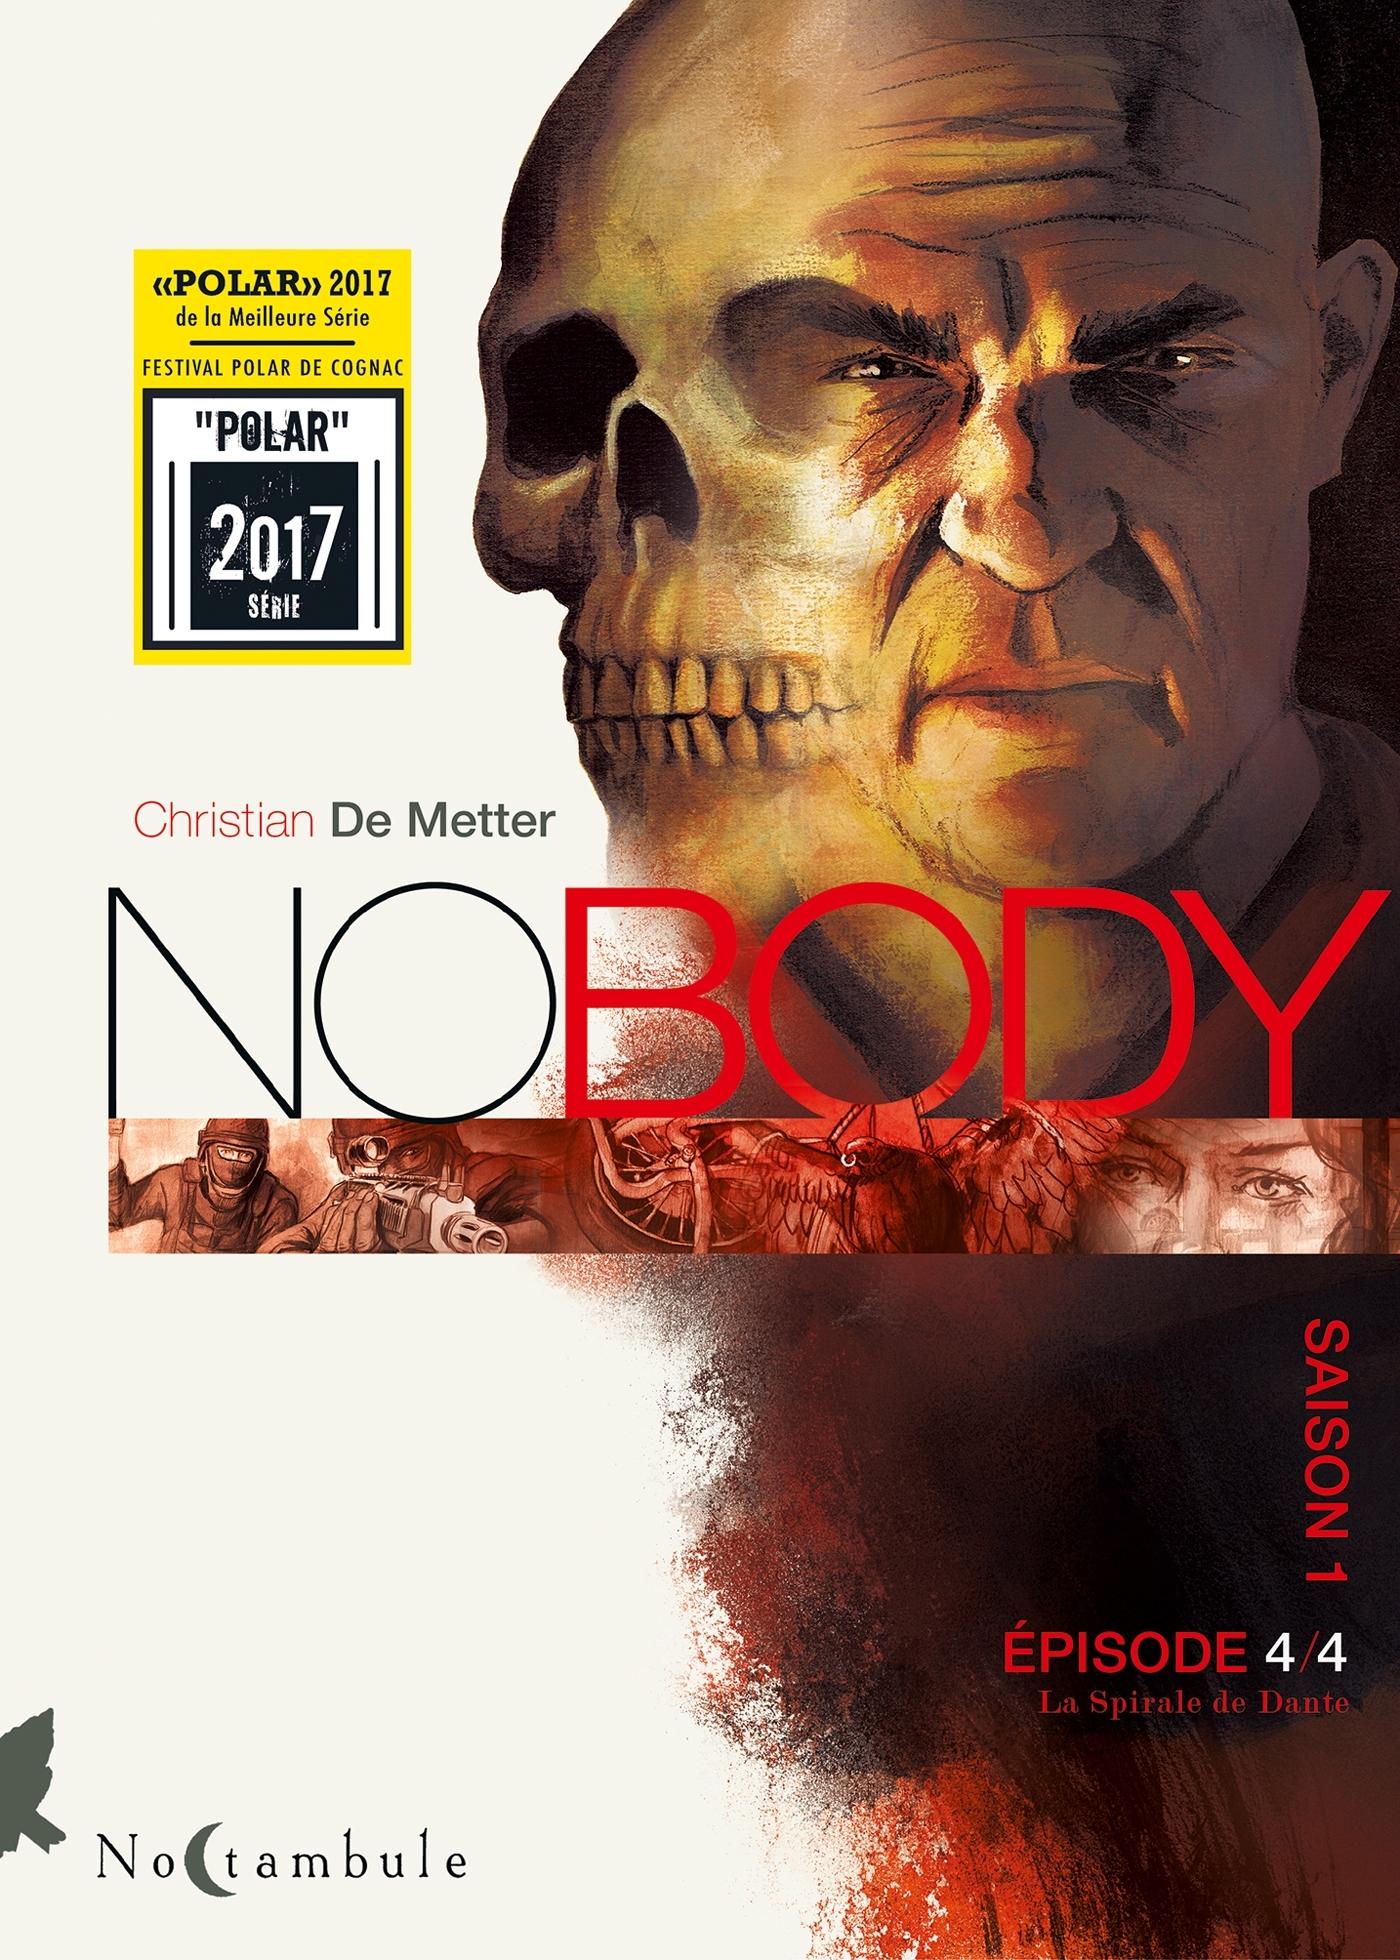 NO BODY SAISON 1 EPISODE 4 - LA SPIRALE DE DANTE